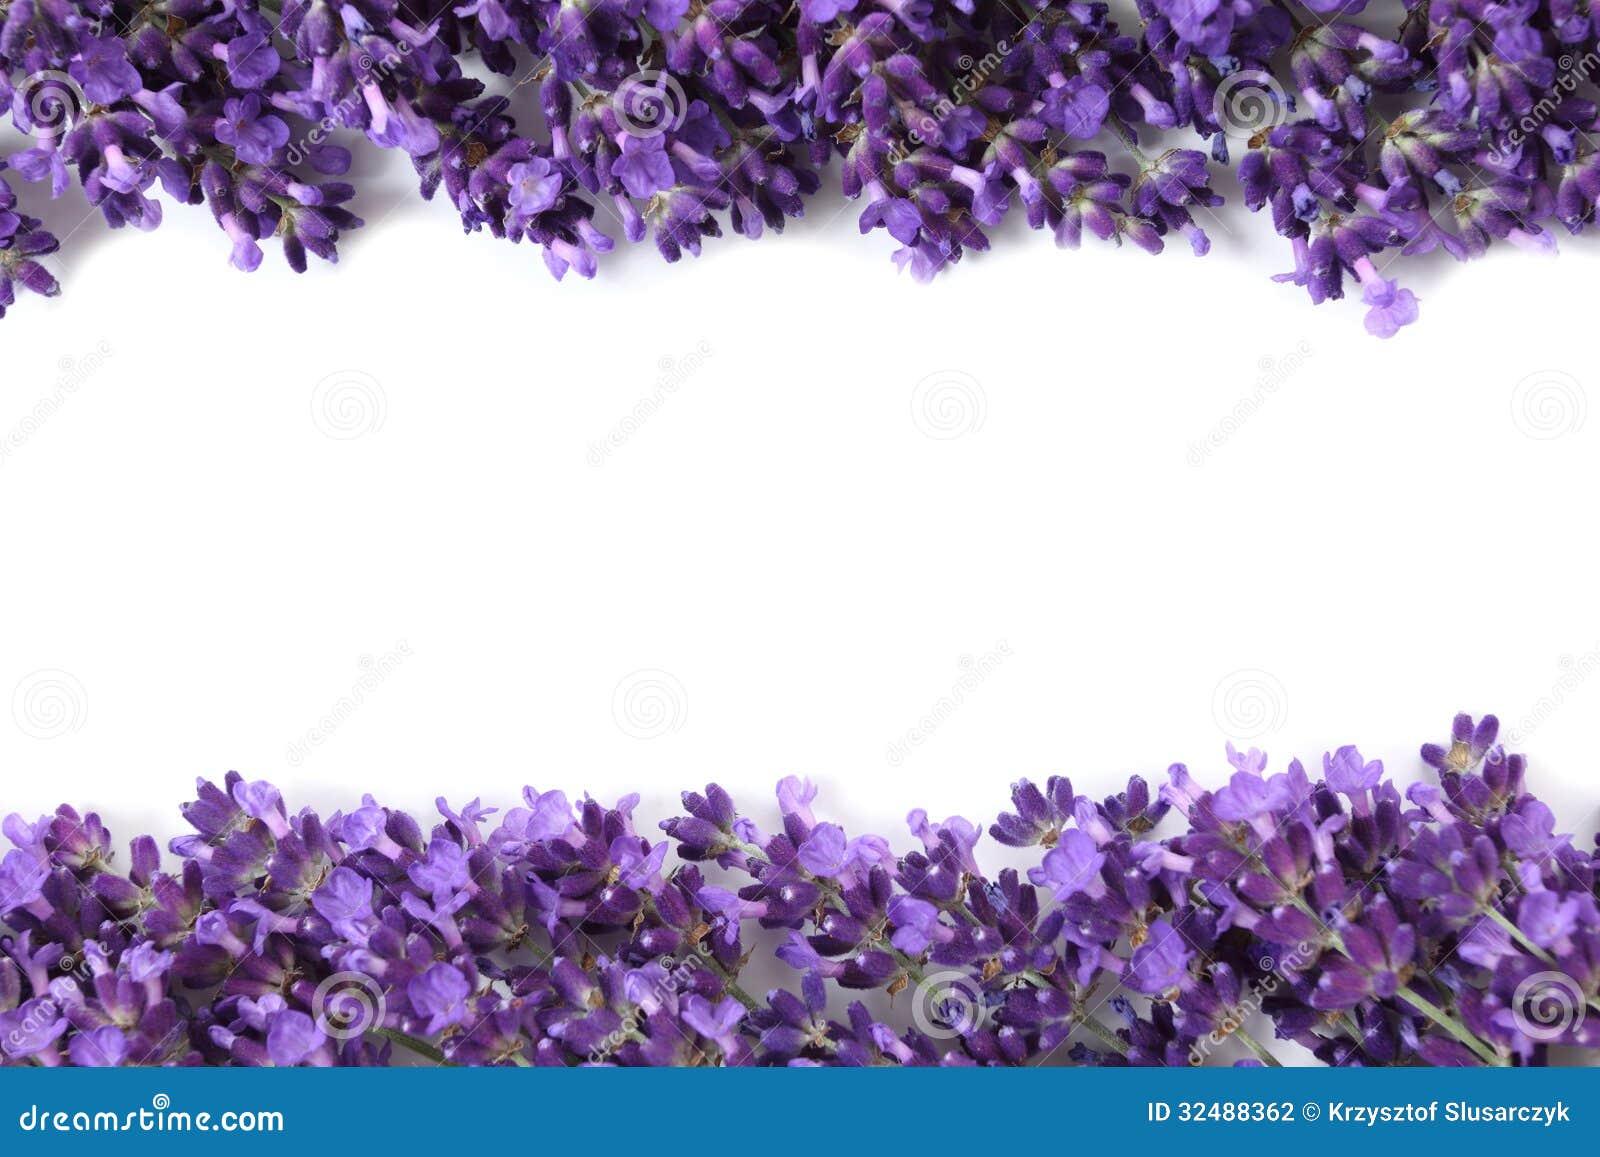 Feld mit Lavendel stockfoto. Bild von jahreszeit, kräuter - 32488362